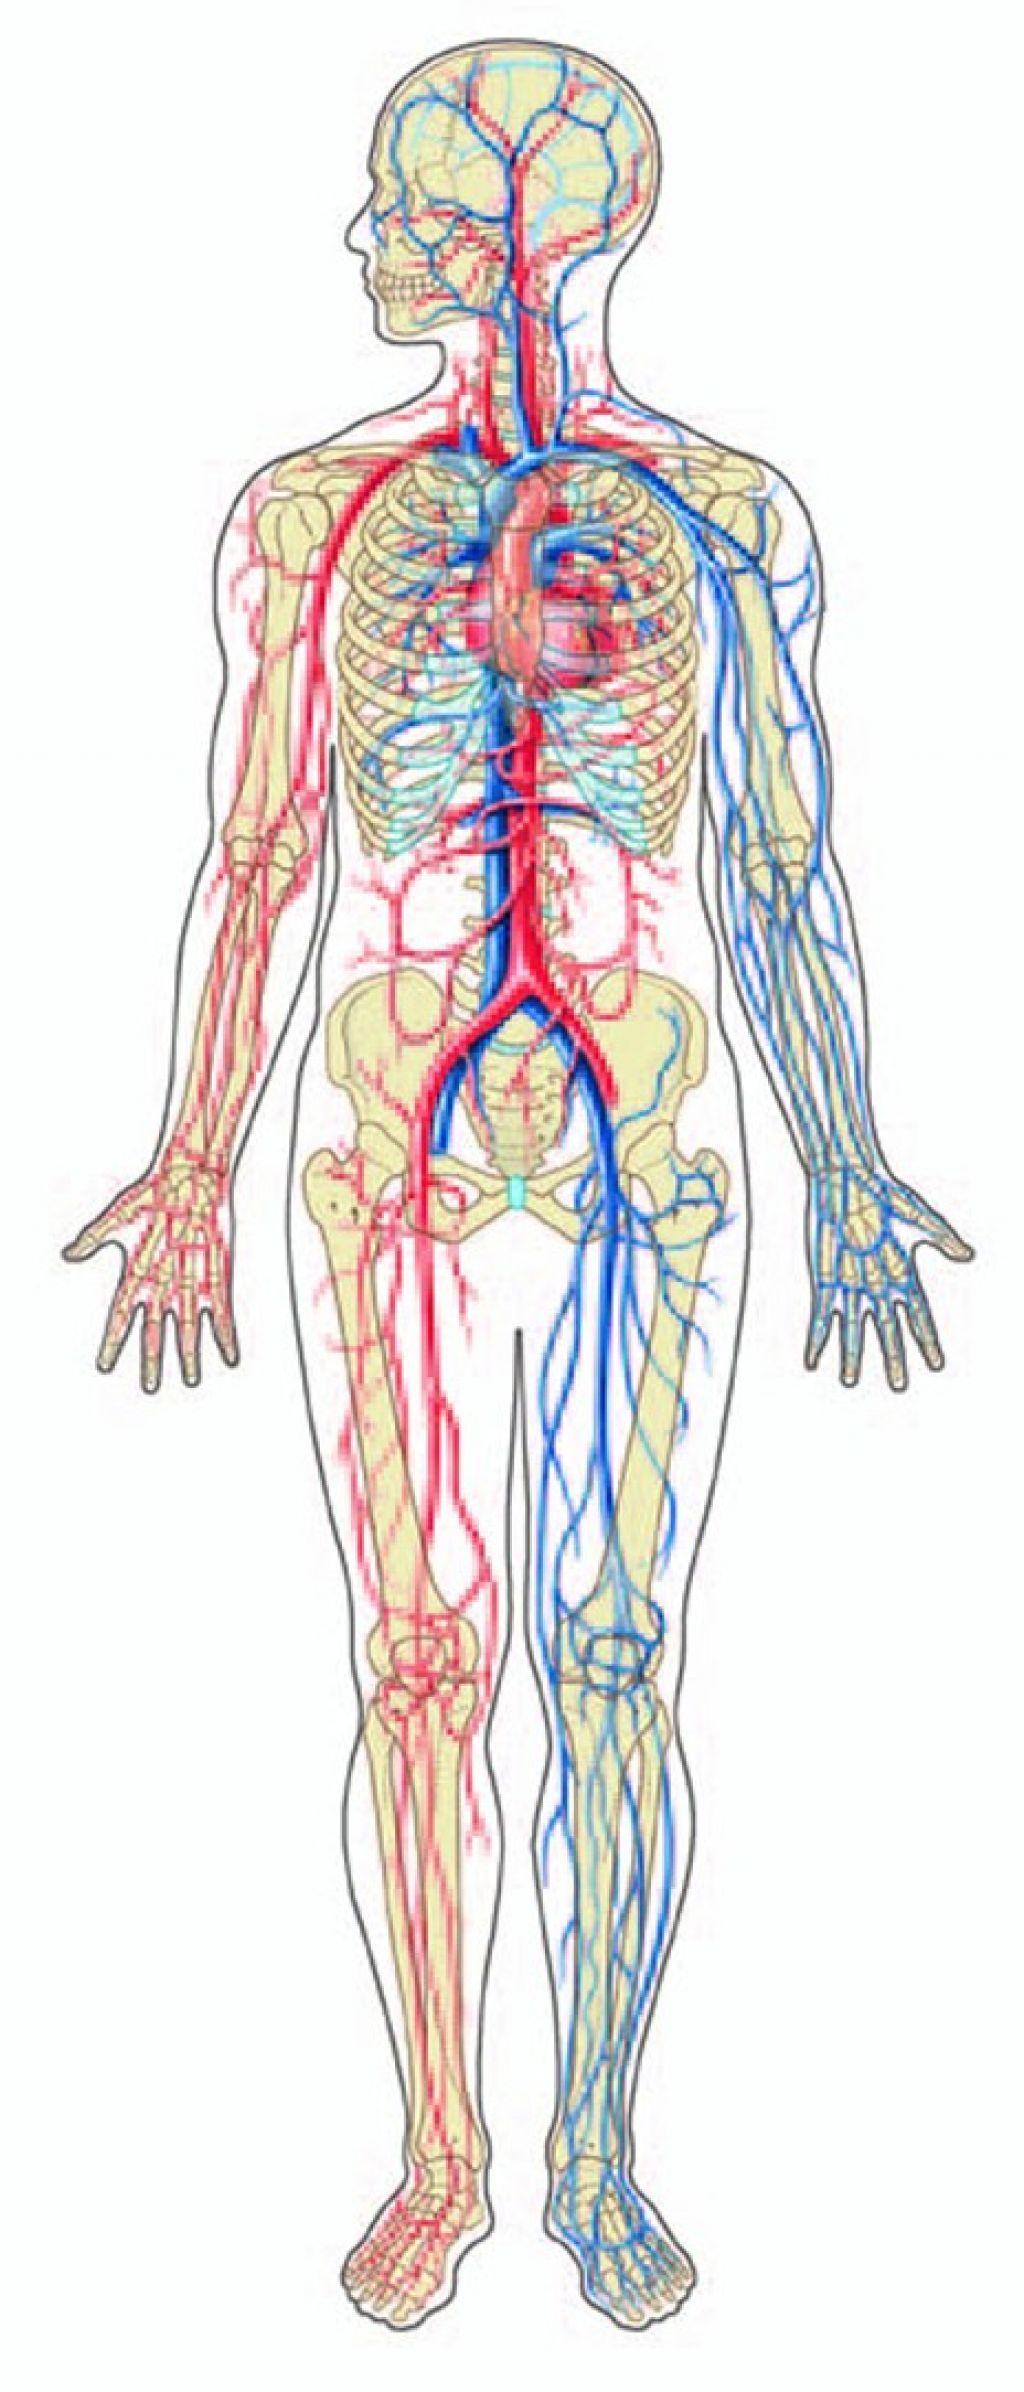 Circulatory System Diagram Black And White